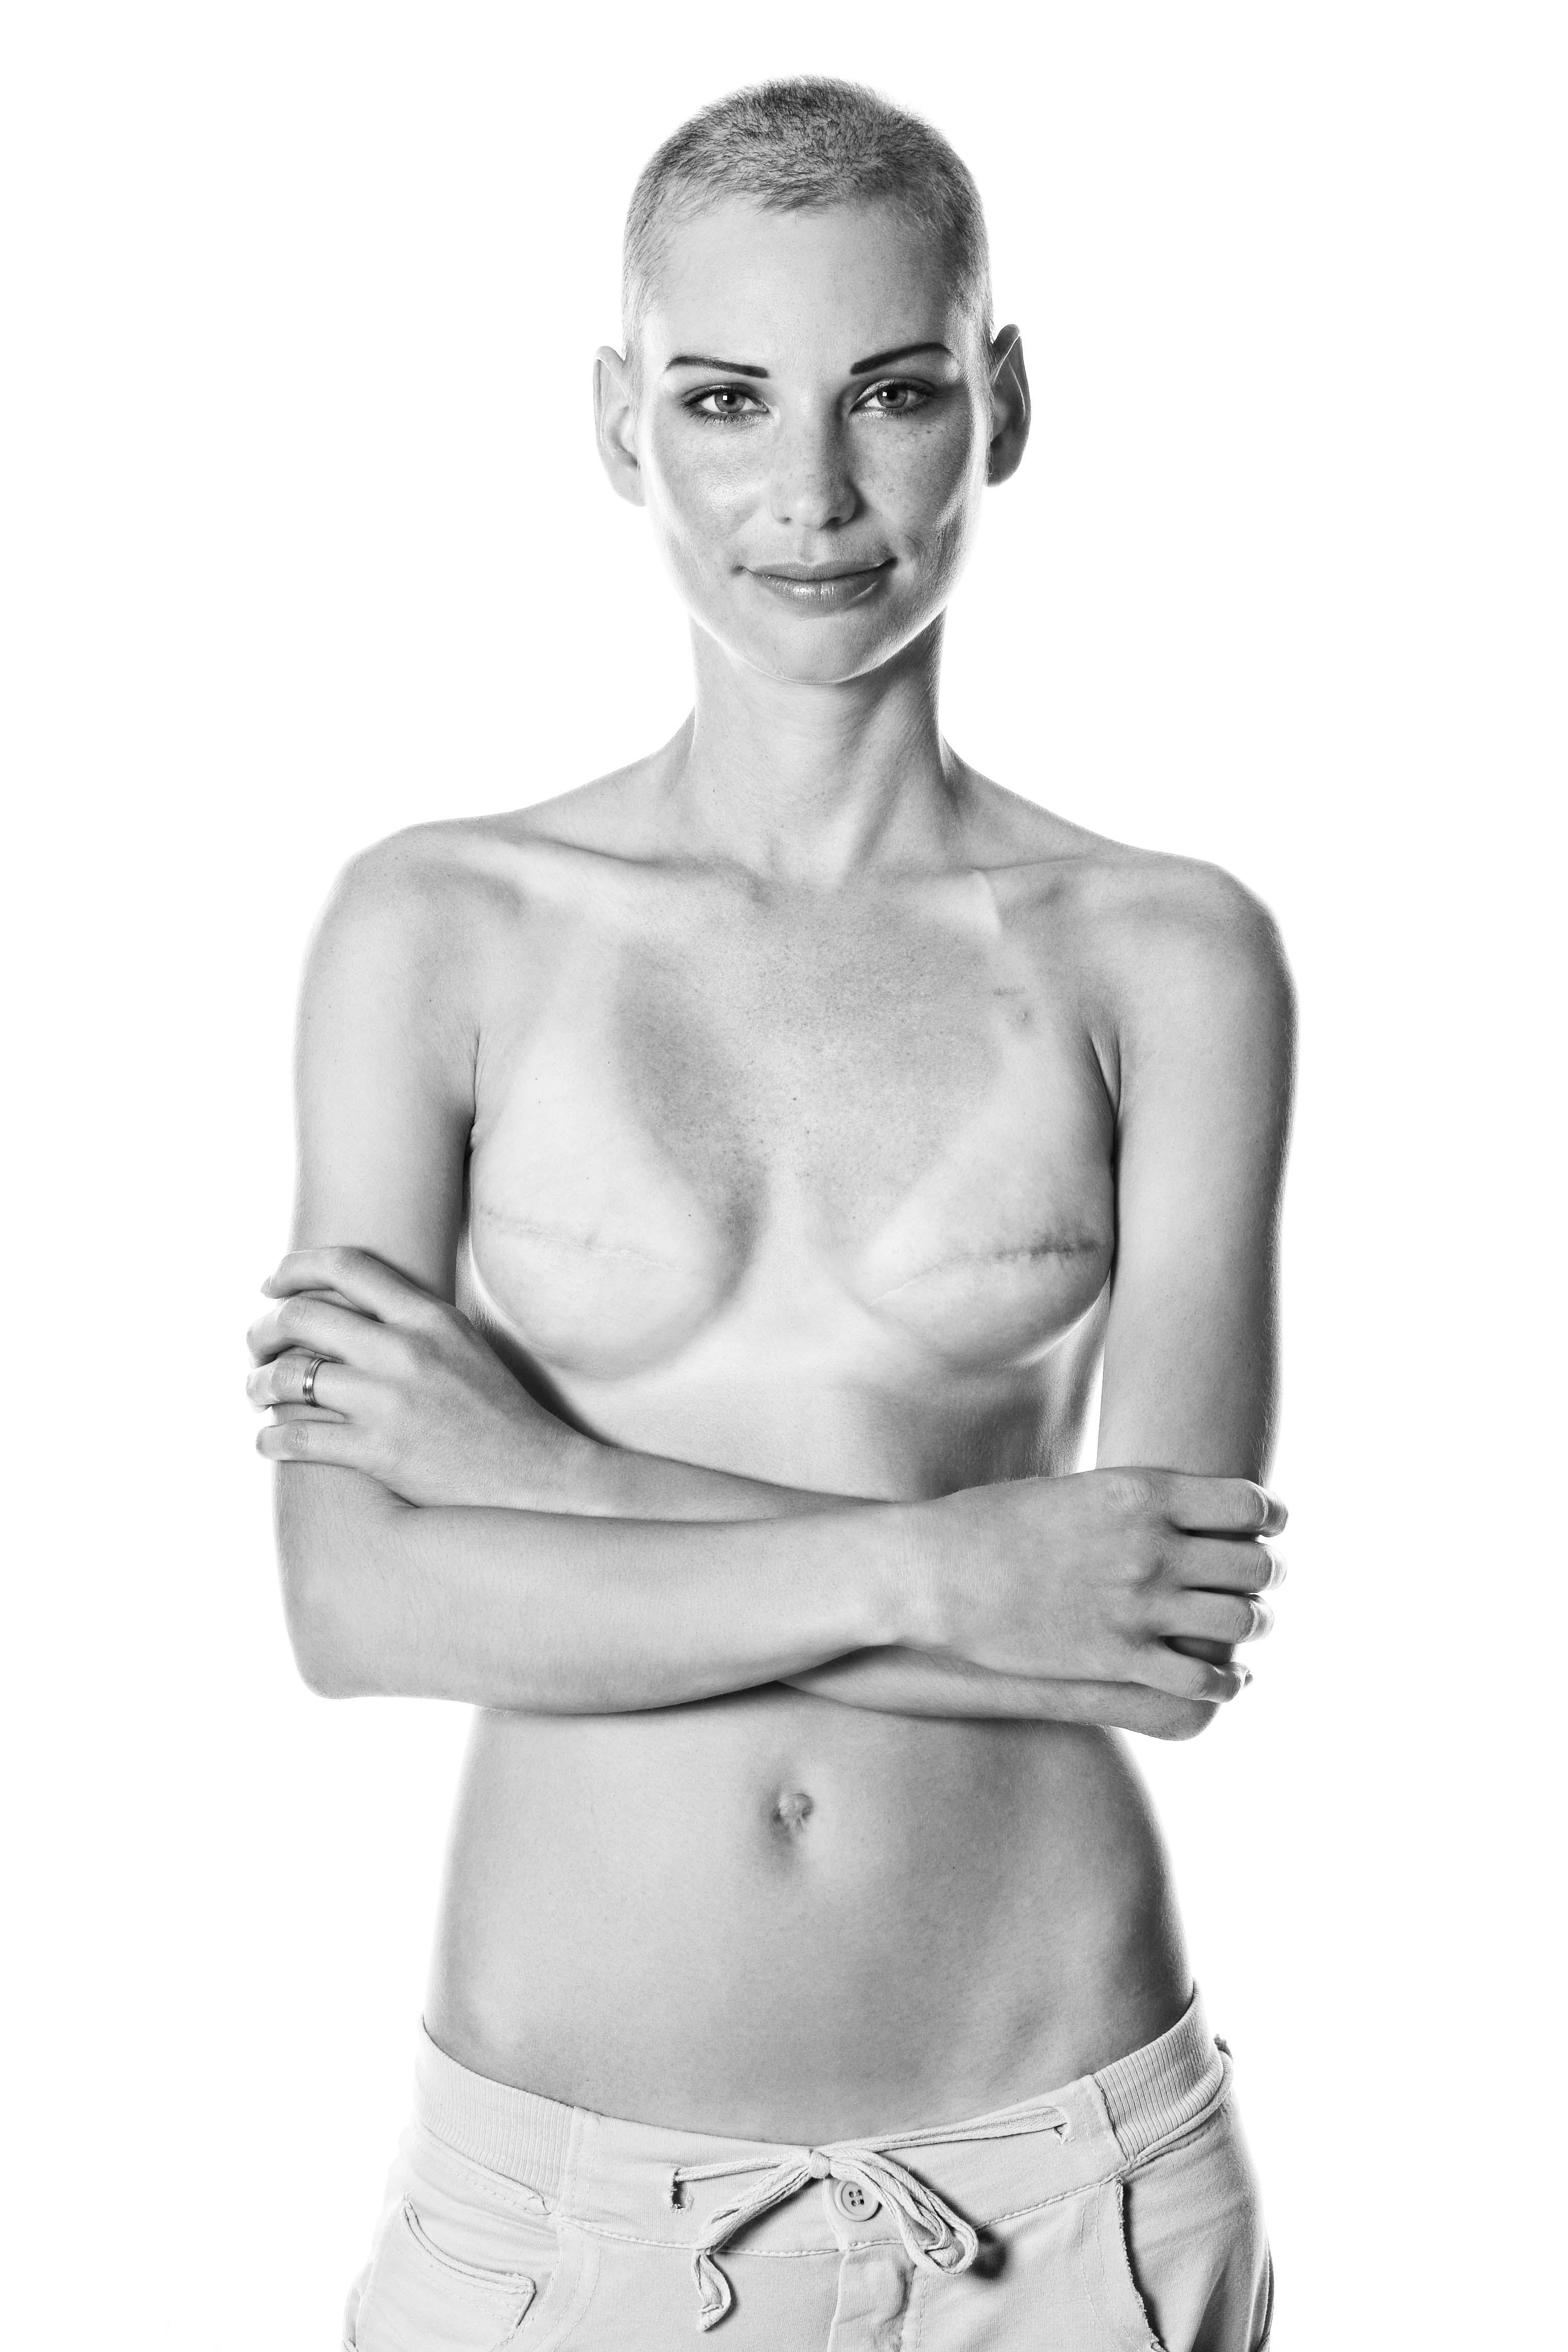 příběhy o prsu starší starší porno videa